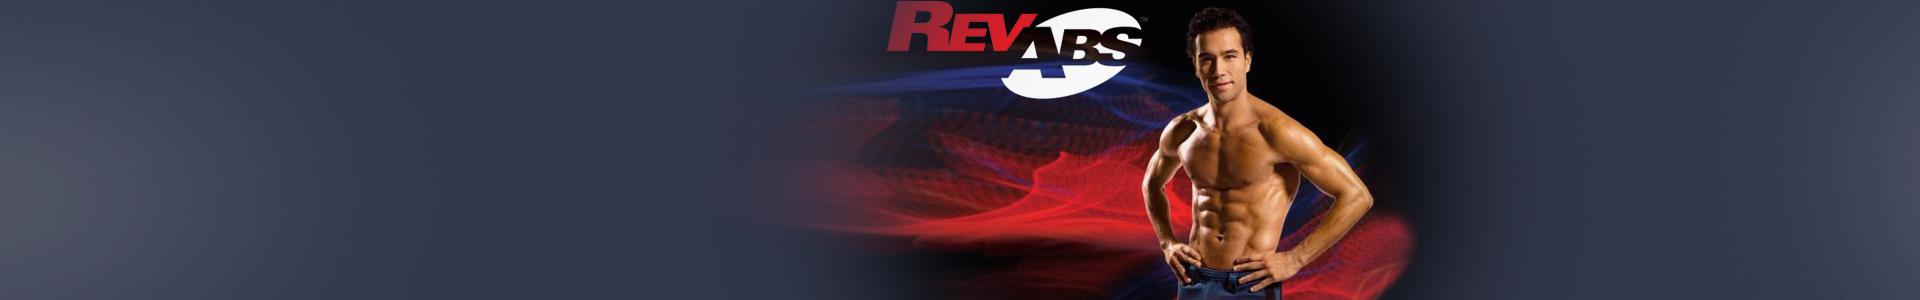 Rev Abs高级版